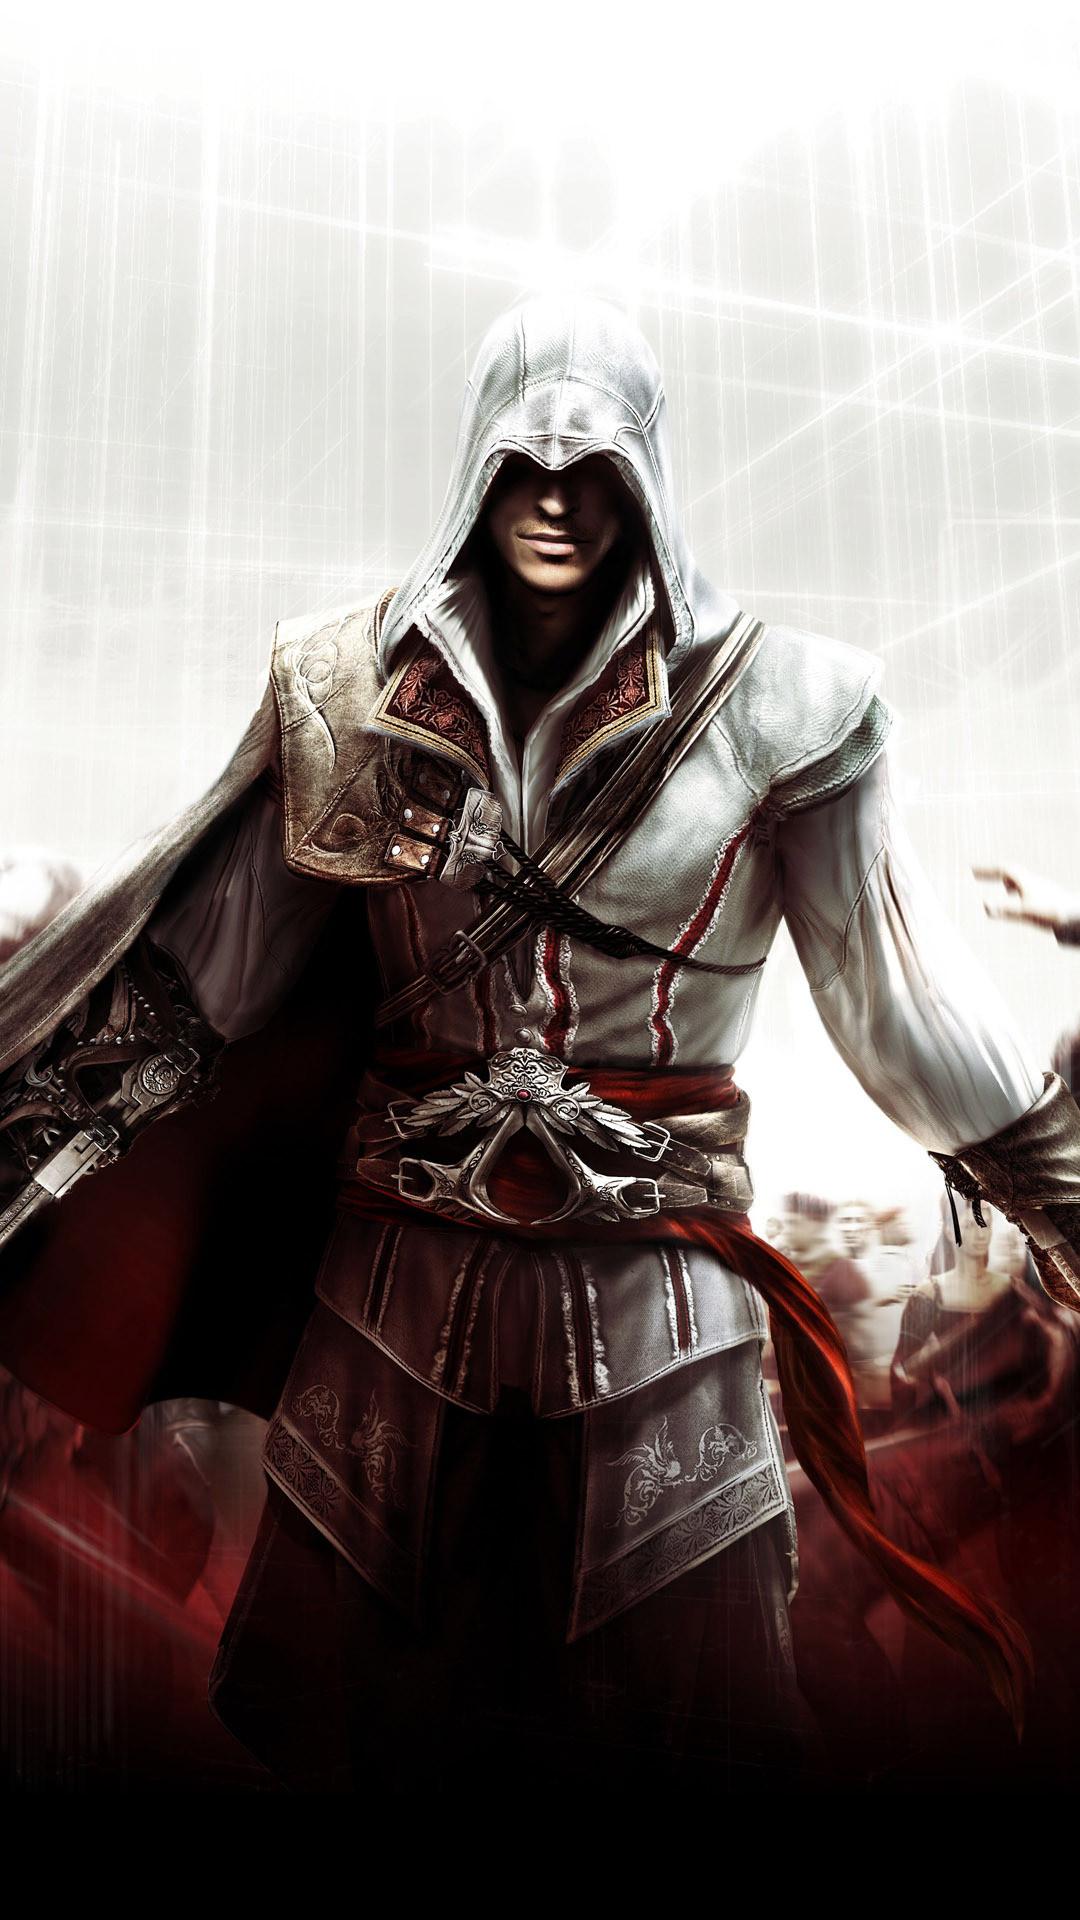 1080x1920 Wallpaperwiki Assassins Creed Wallpaper Widescreen For Iphone